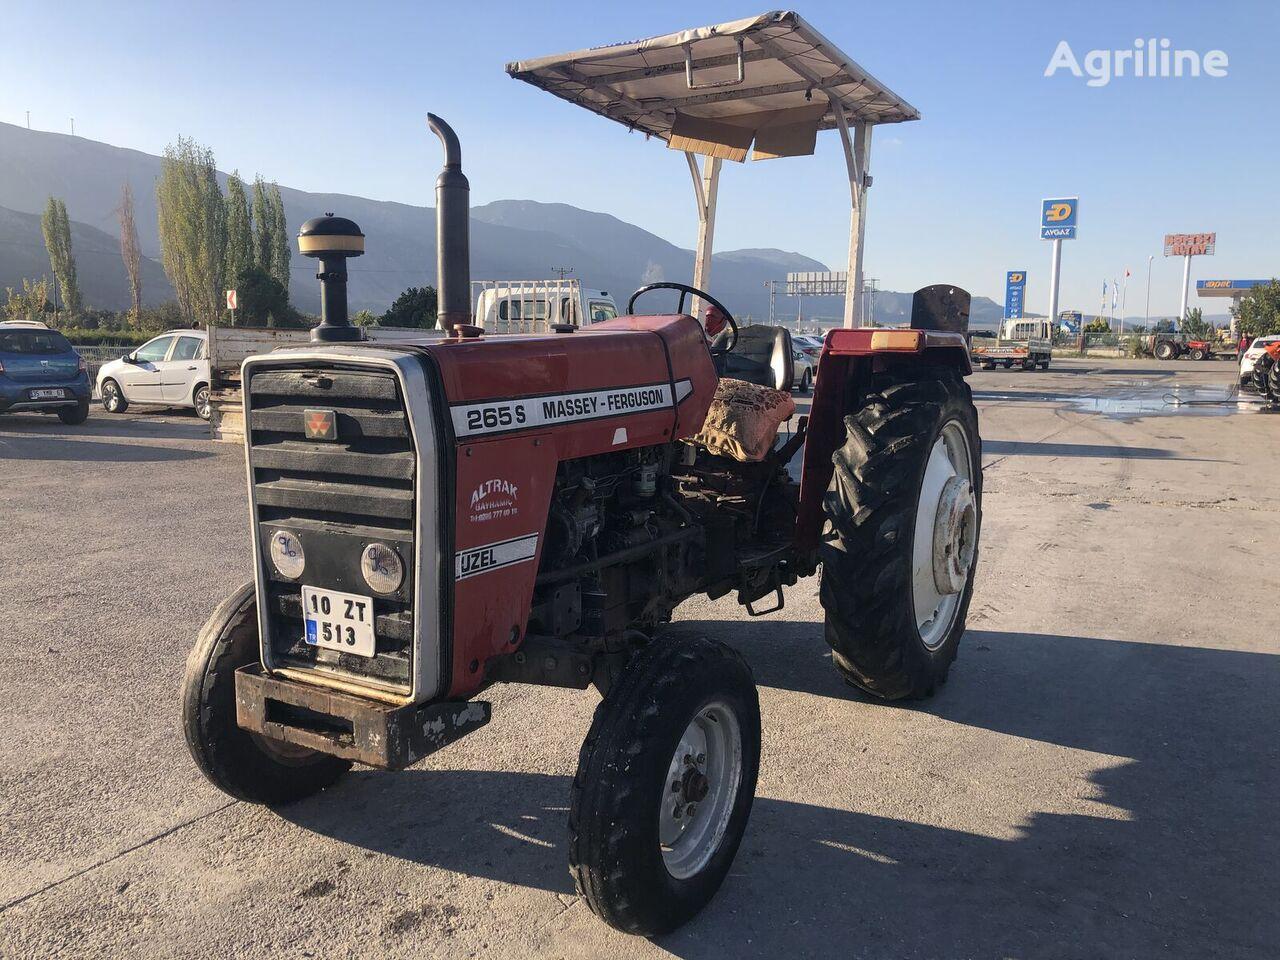 MASSEY FERGUSON 265 S wheel tractor